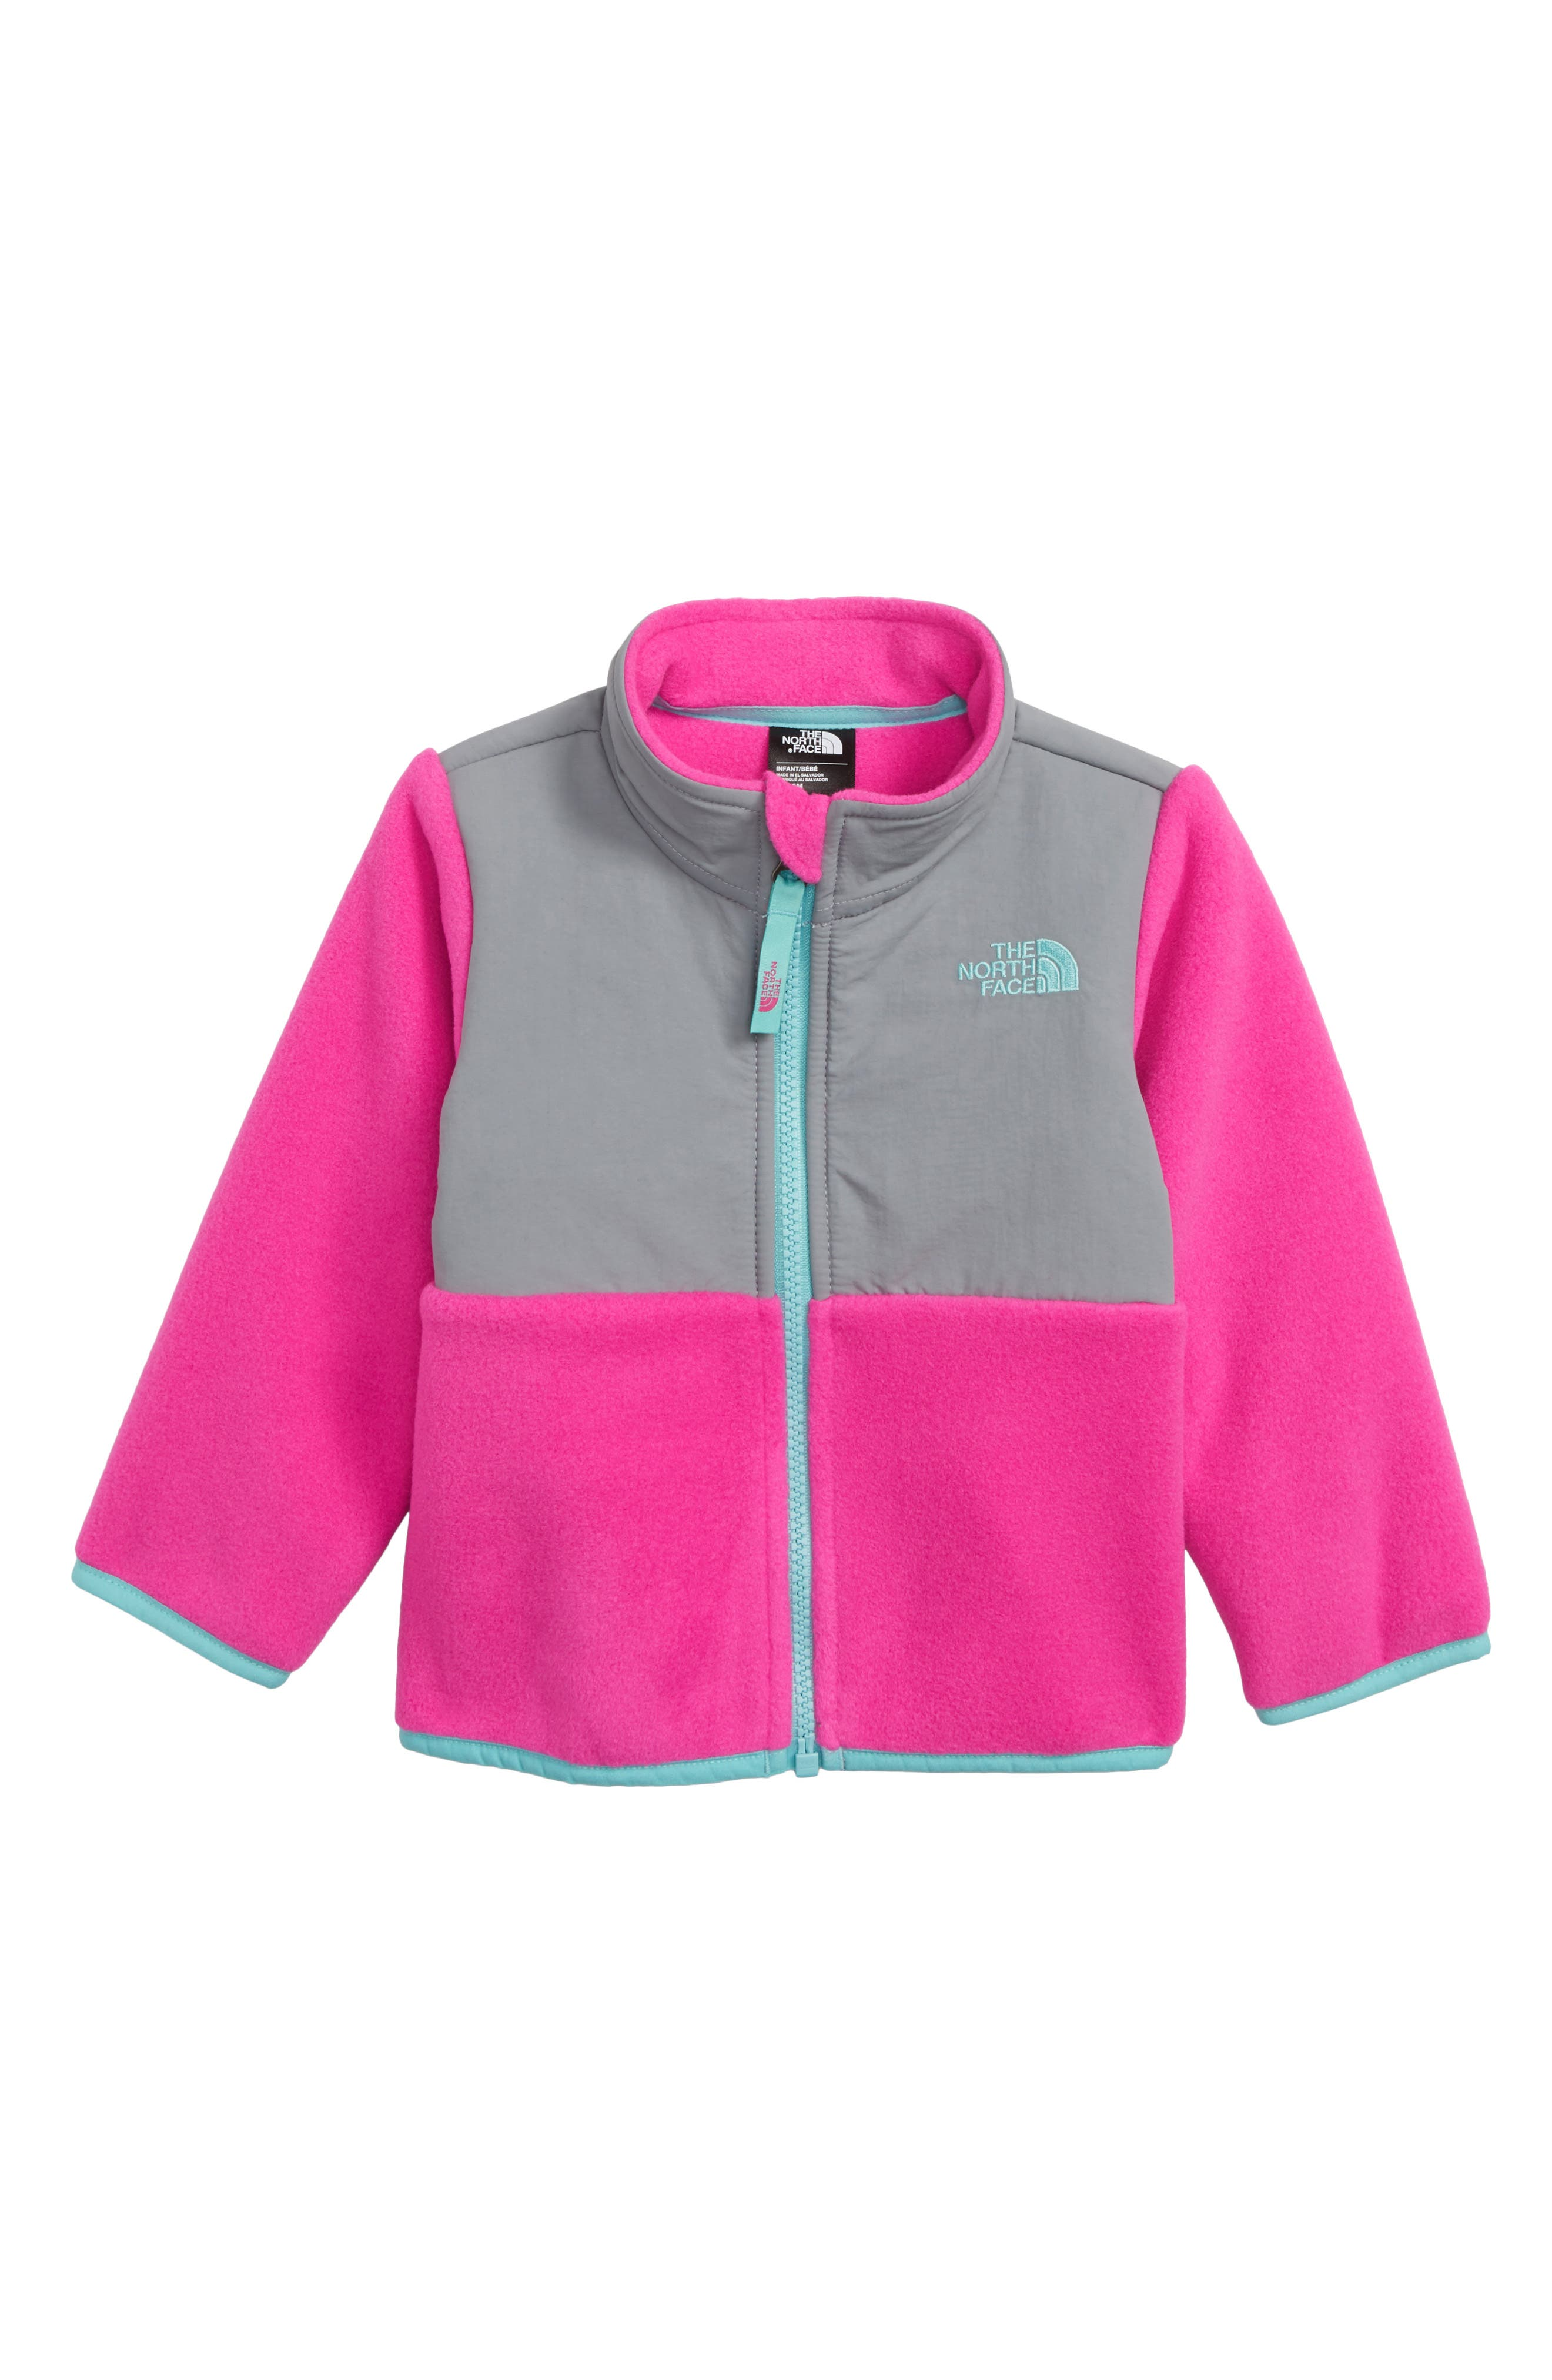 THE NORTH FACE, Denali Thermal Fleece Jacket, Main thumbnail 1, color, AZALEA PINK